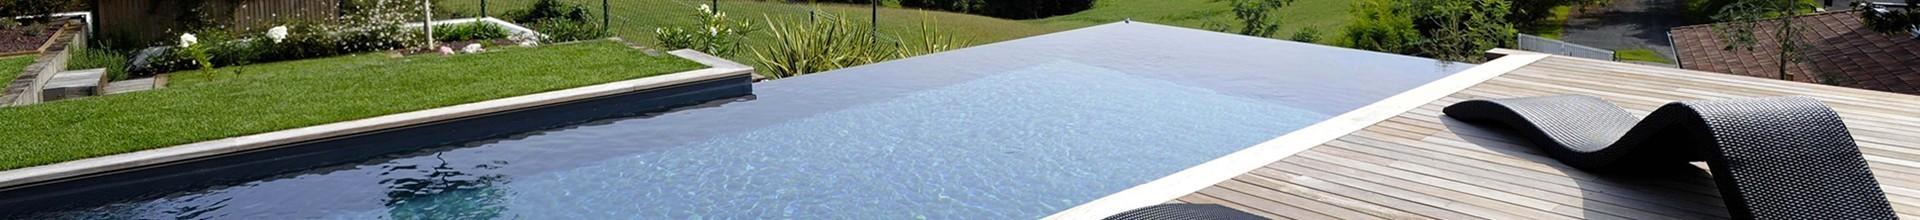 Direct usine, piscine coque prix Savoie